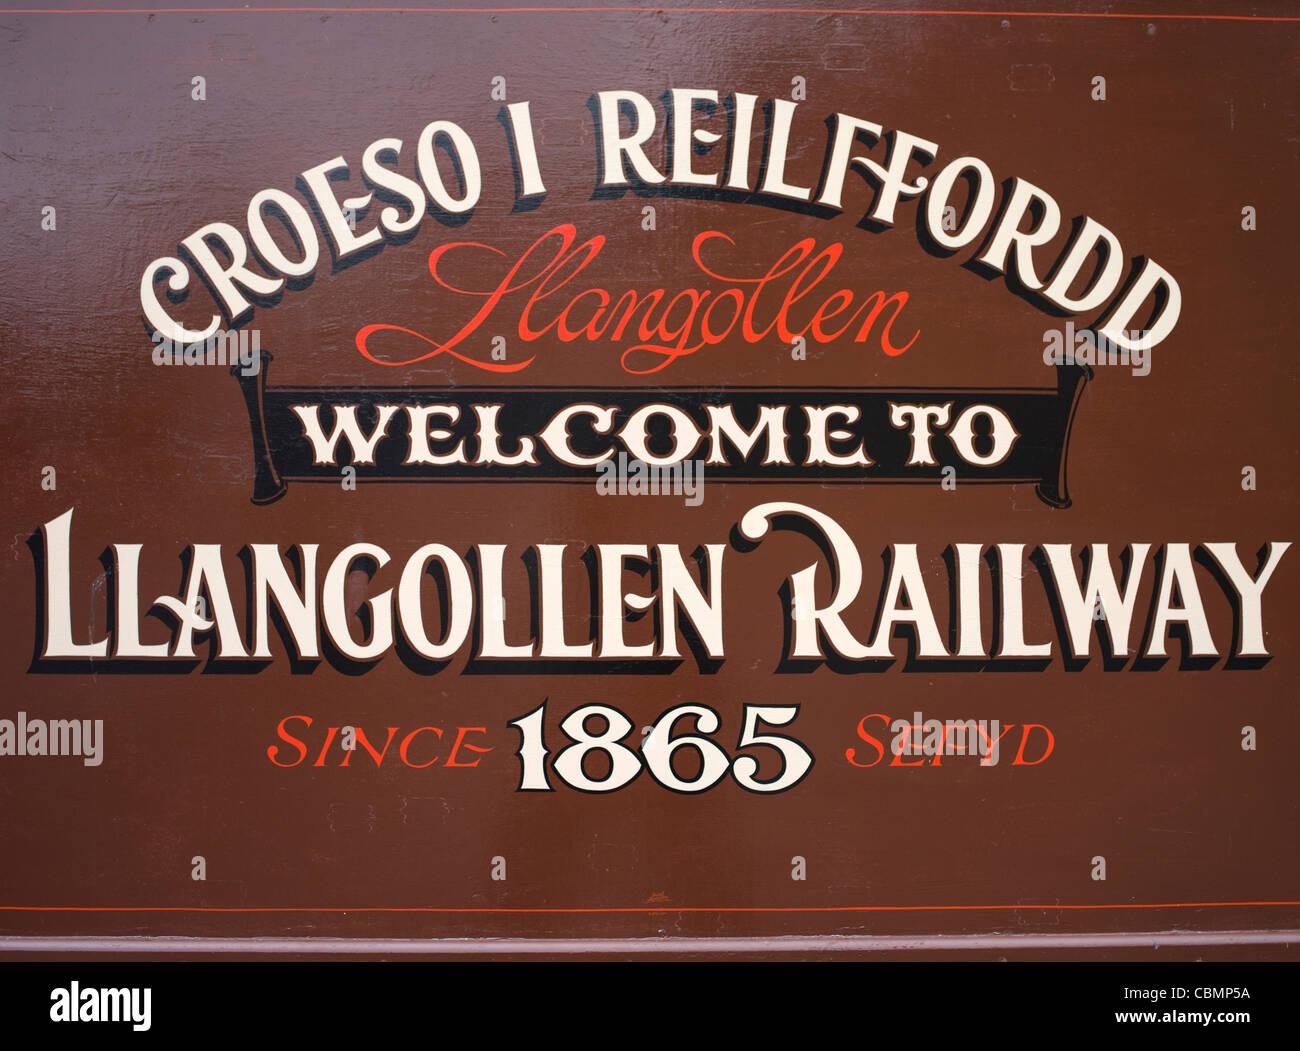 Llangollen Railway sign Denbighshire Wales Stock Photo